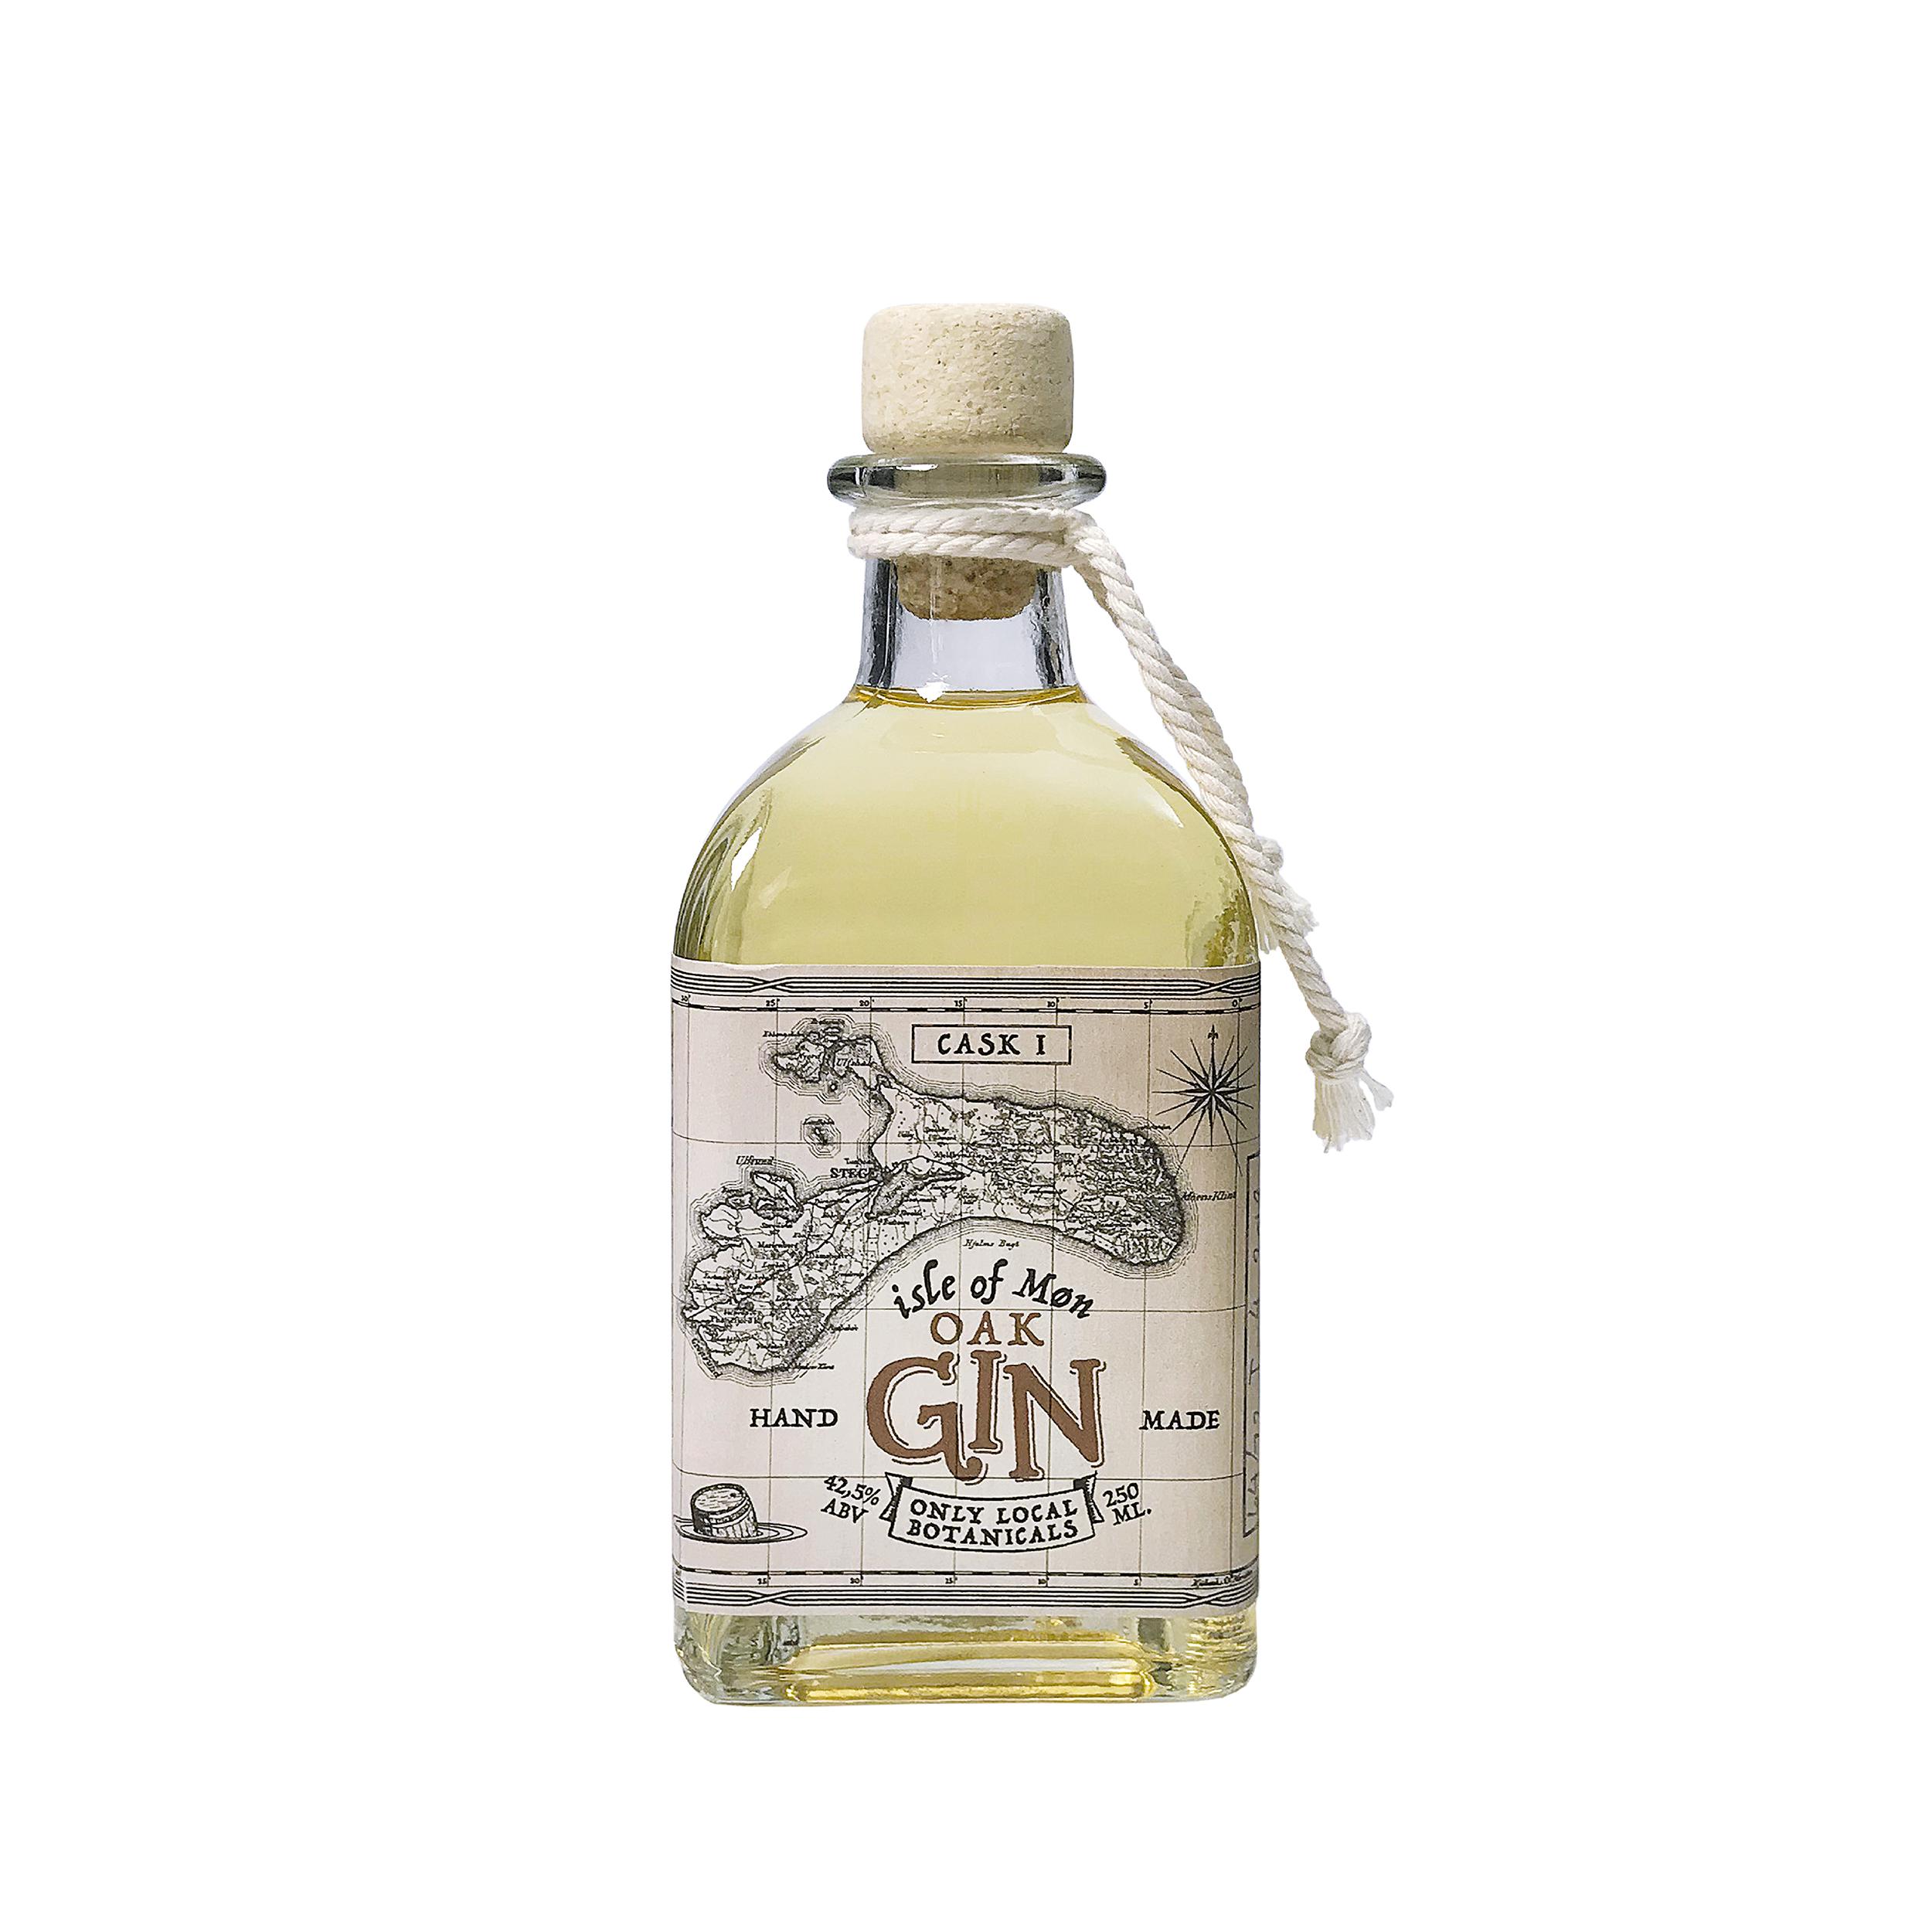 Productshots_Gin-01.png